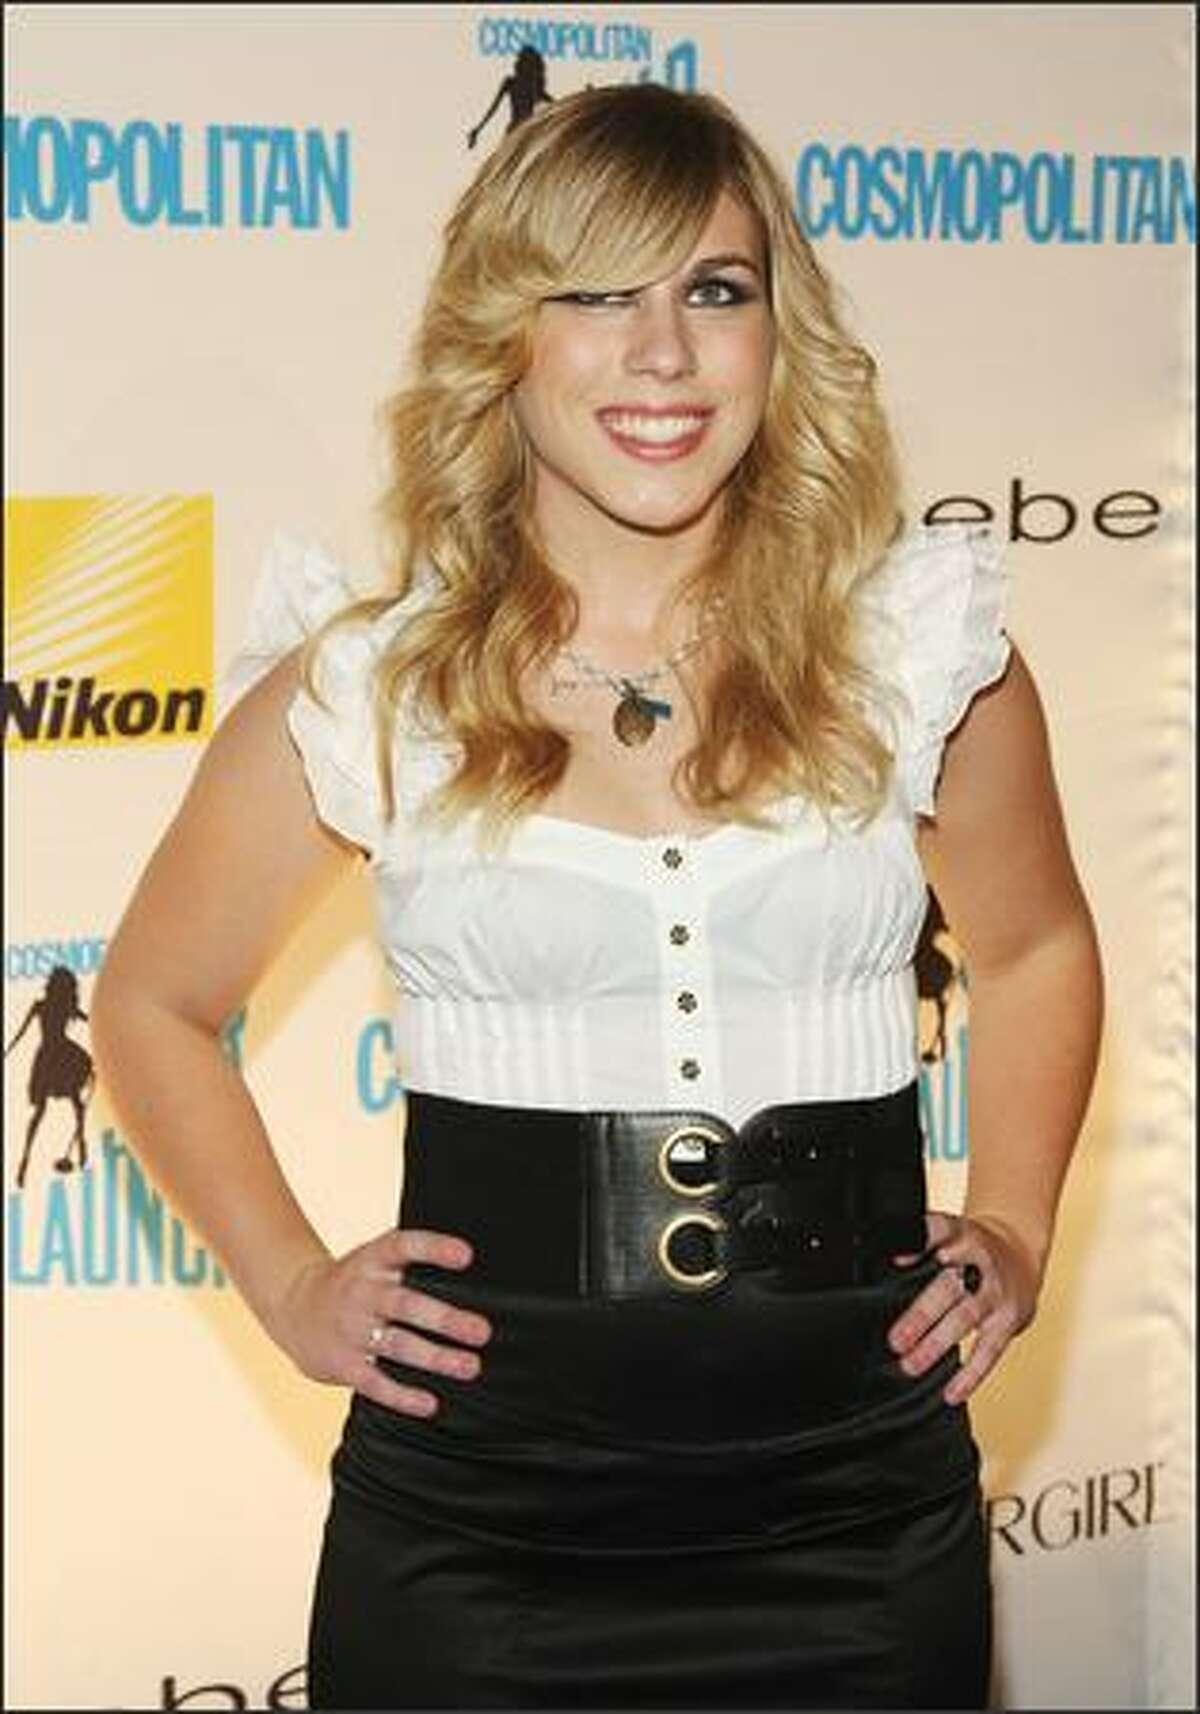 Singer Alexa Wilkinson attends the Starlaunch Finale concert.